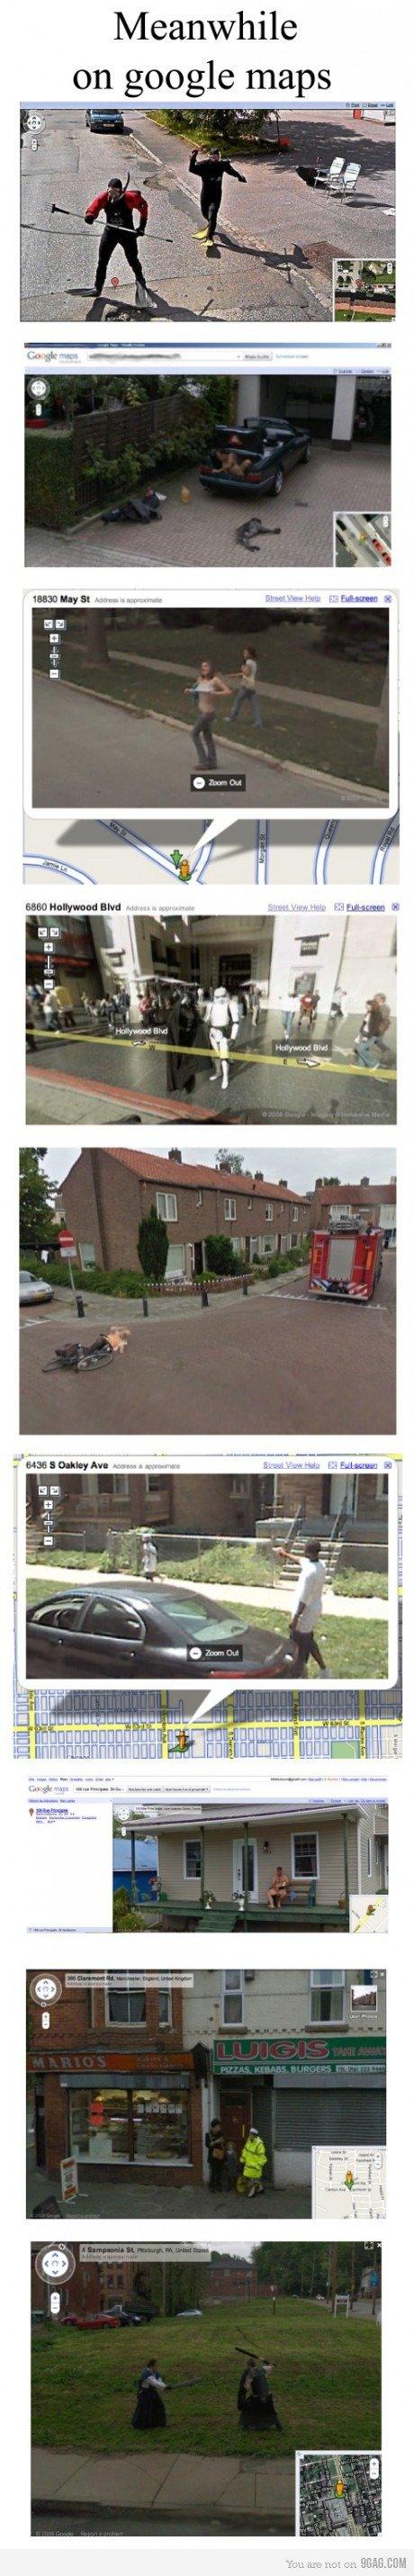 Meanwhile in google maps.. 110% oc. True story.. Meanwhile Eil, HUI I Eh r. igtg. trololol funny lol Google maps fail